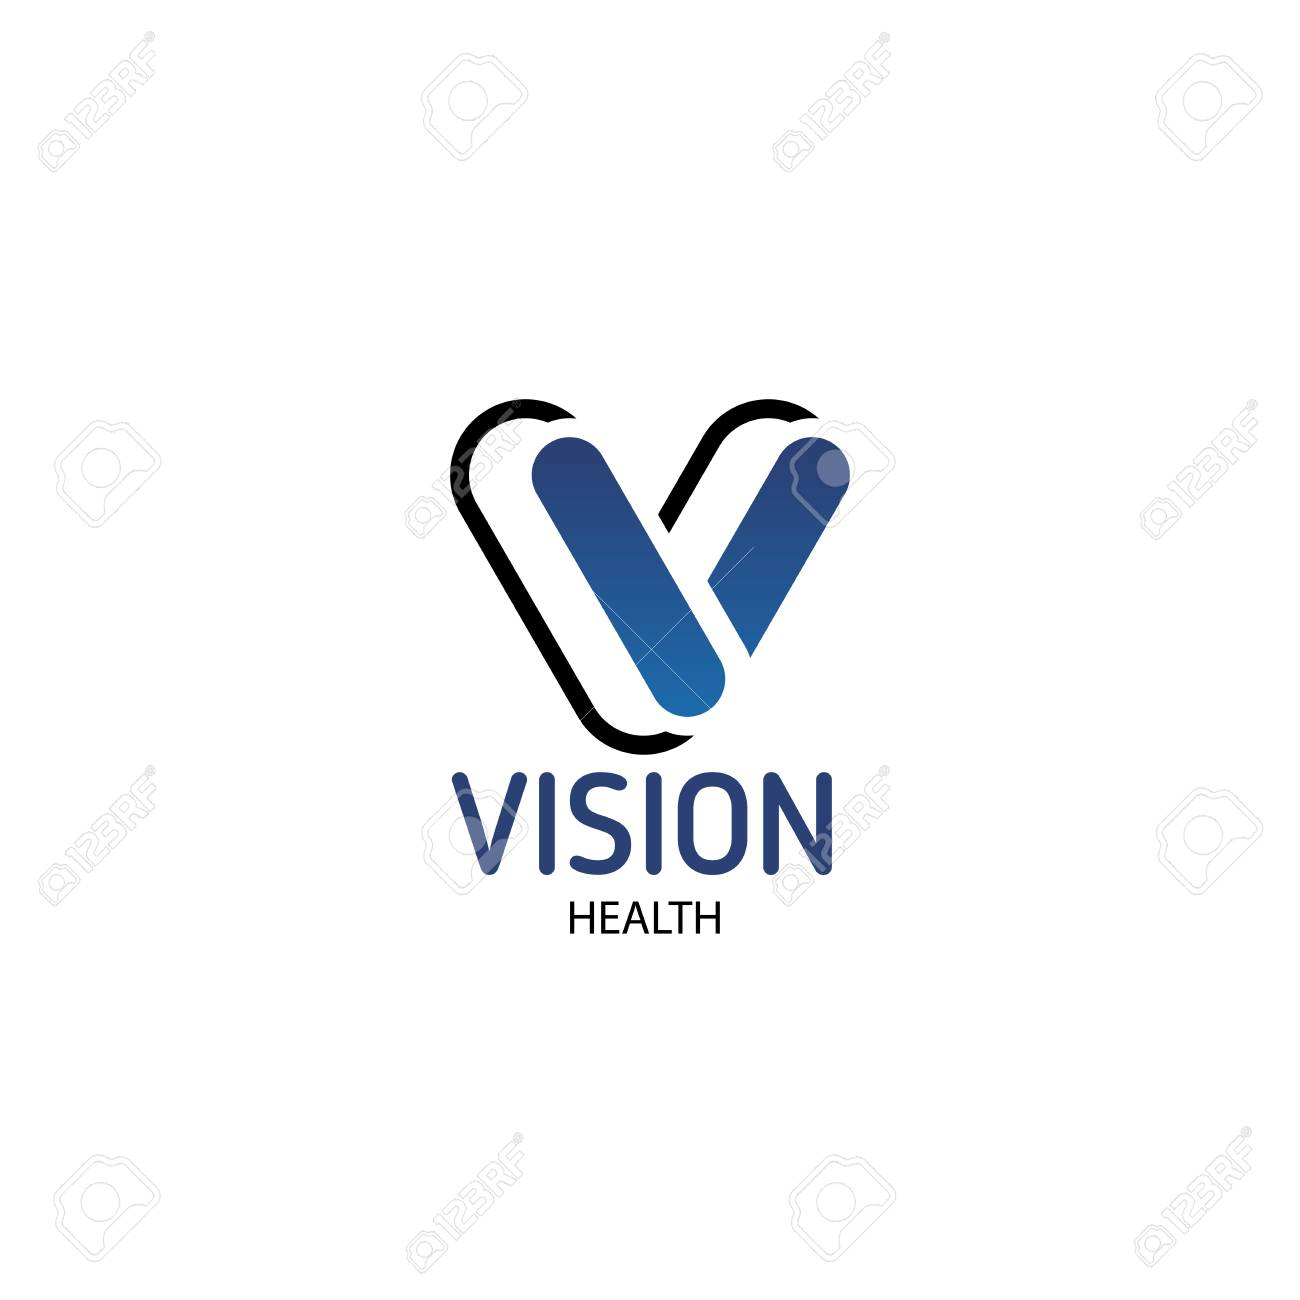 Vector emblem vision health  Creative design for eye clinic or